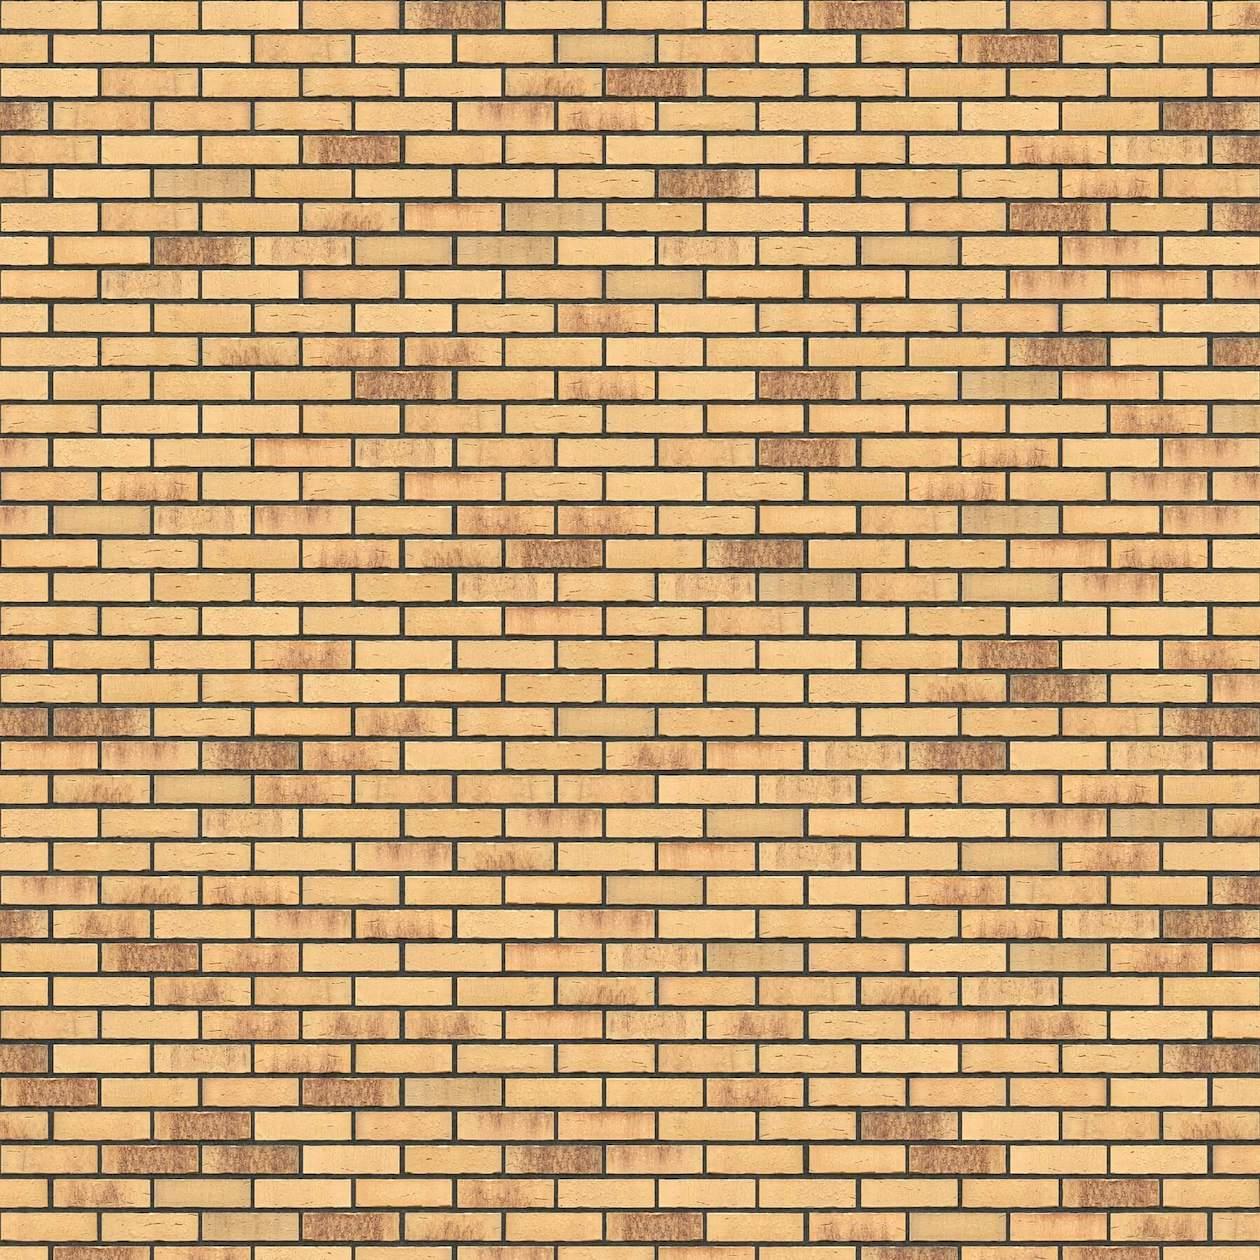 Puna-cigla-FeldHaus-Klinker-brick-house-nf-k-734-Antracit Fuga